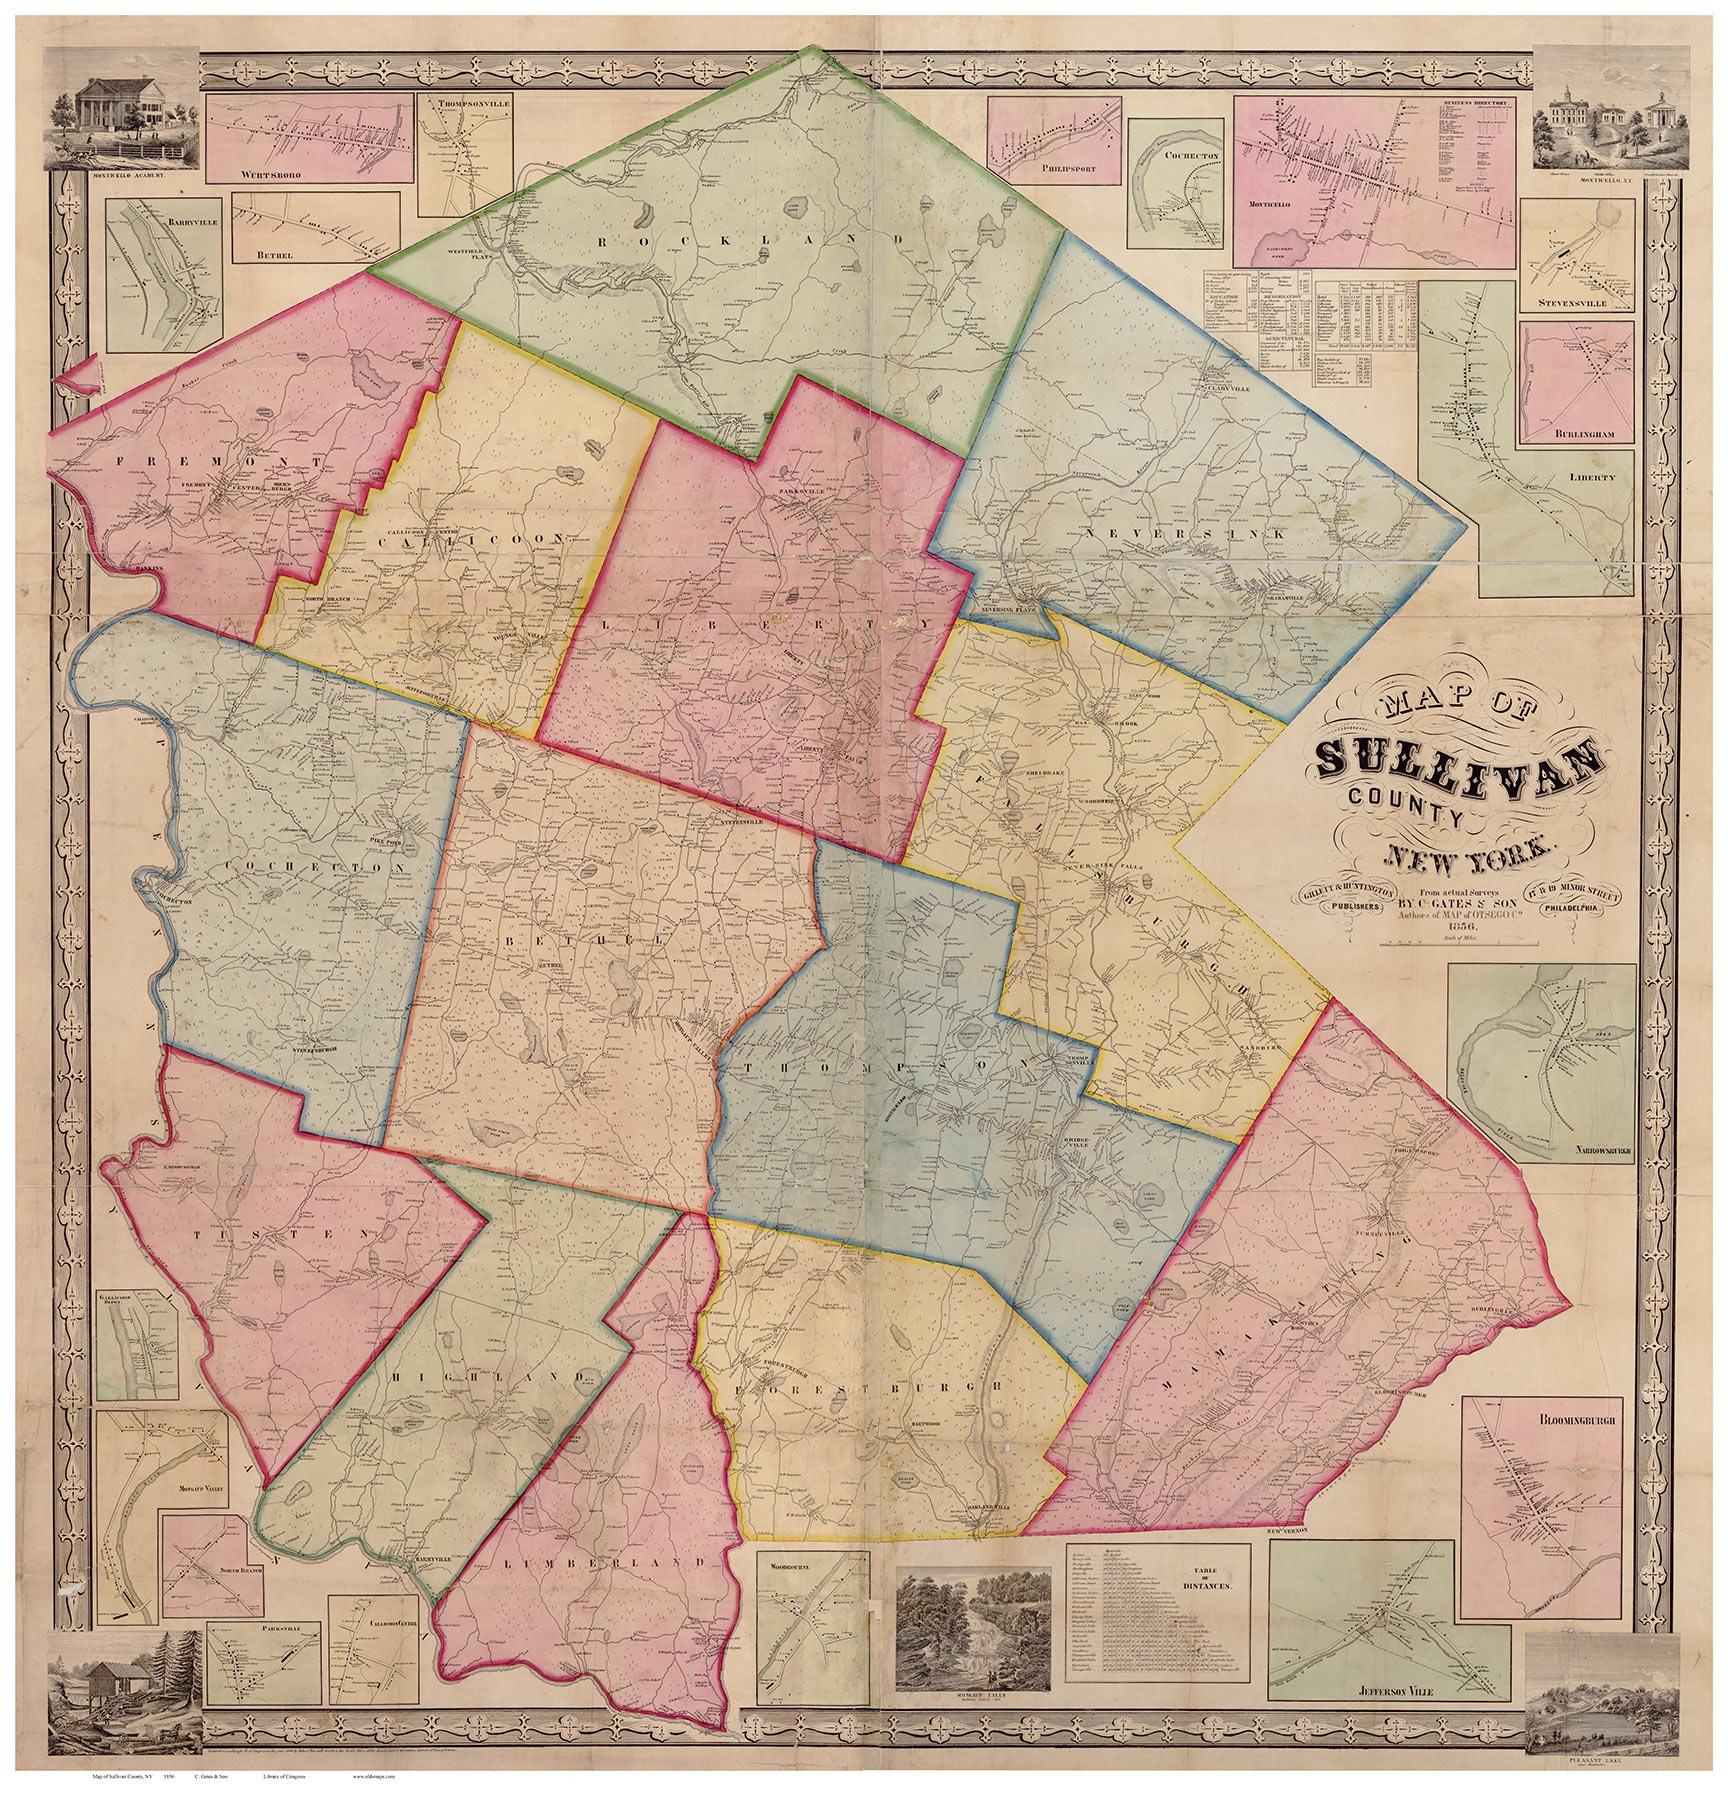 1856 Map of Sullivan County NY from actual surveys